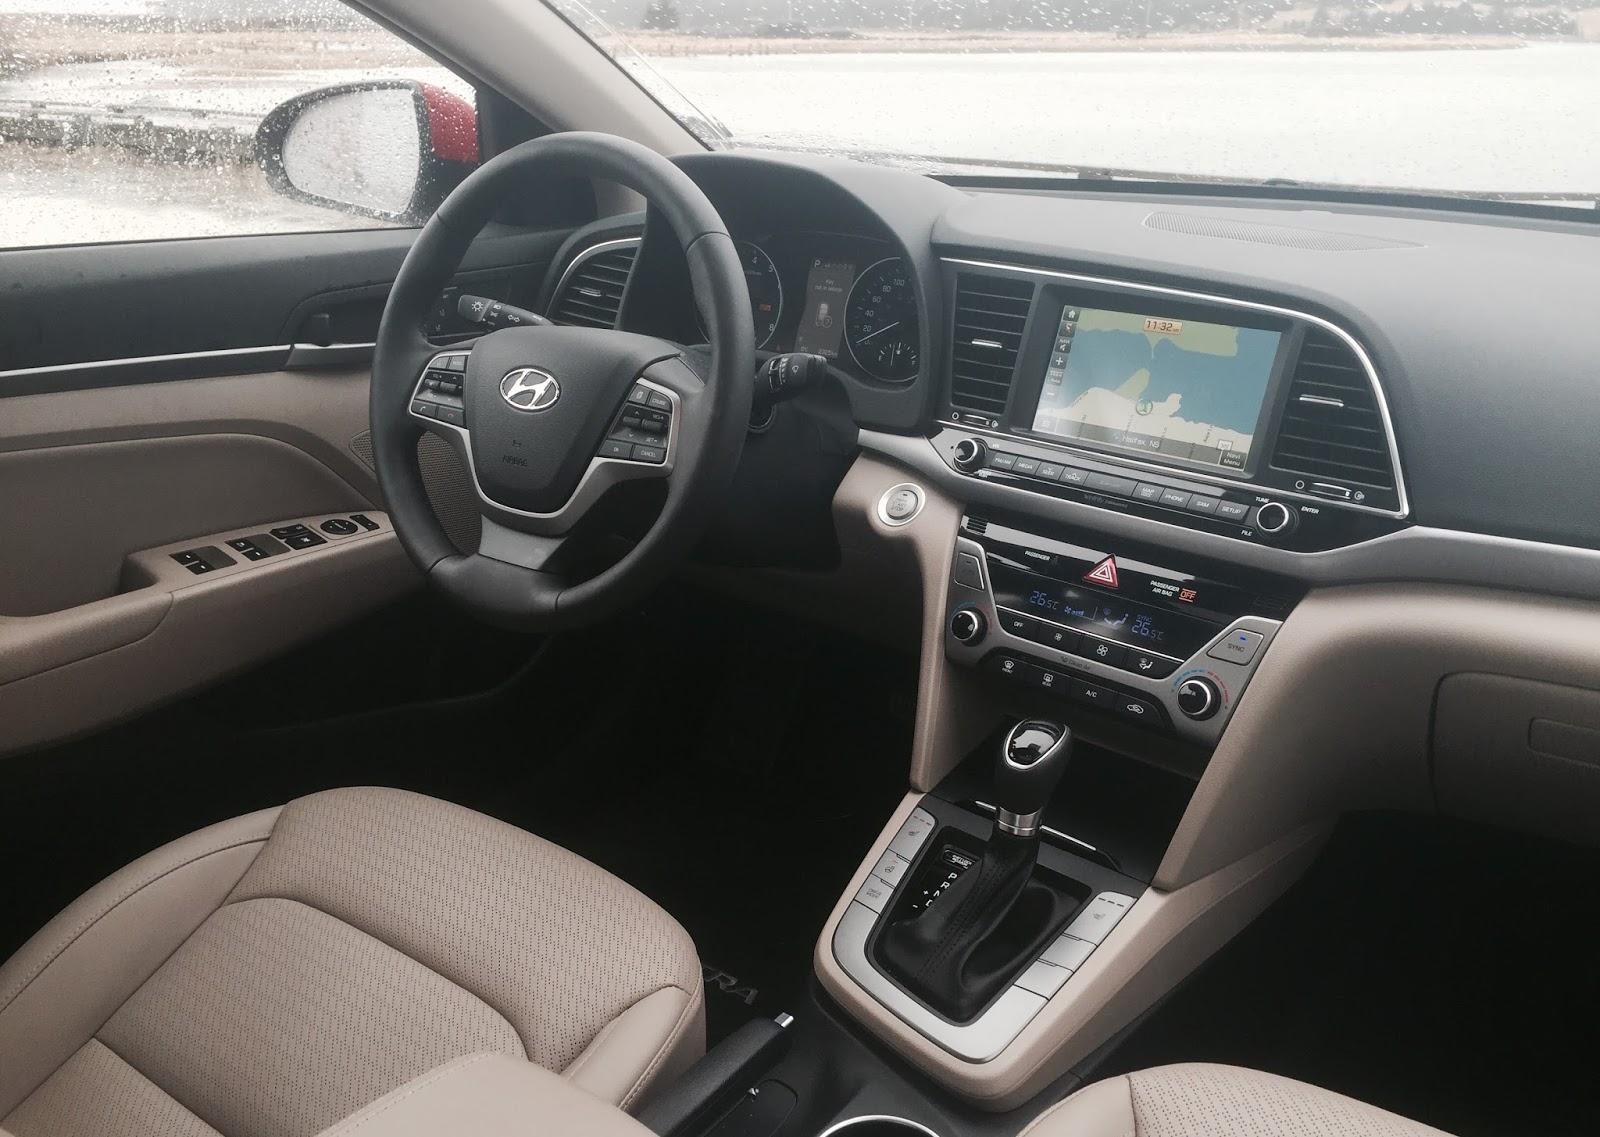 Hyundai Elantra Interior 2017